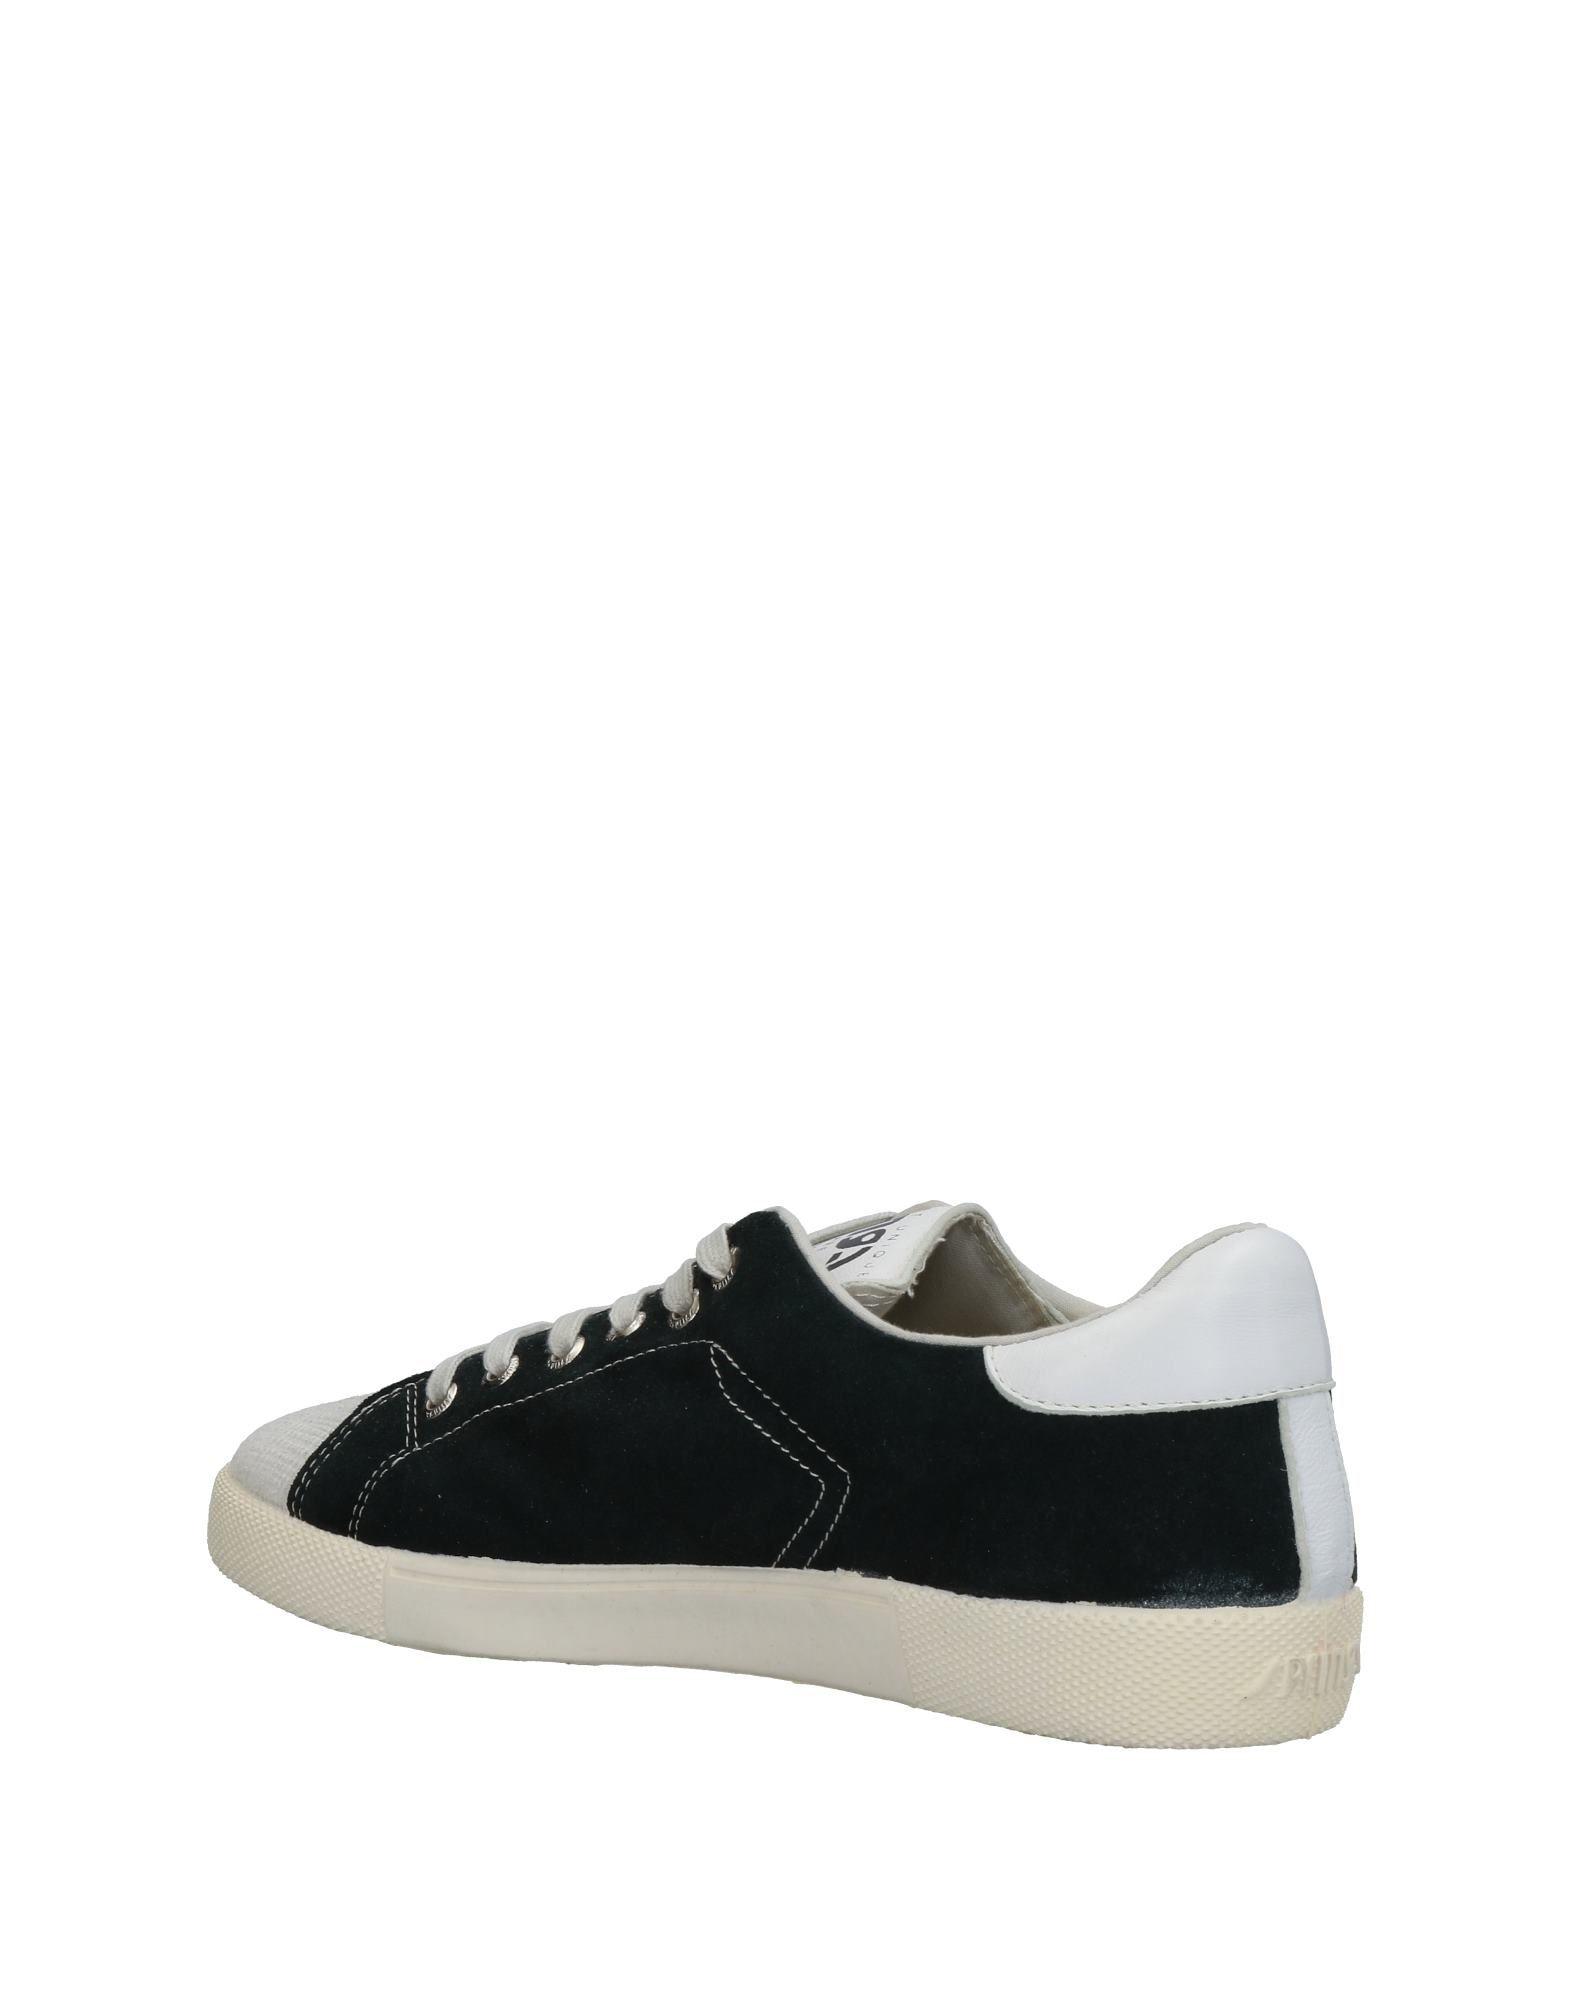 11457321WL Springa Sneakers Herren  11457321WL  b0f72c